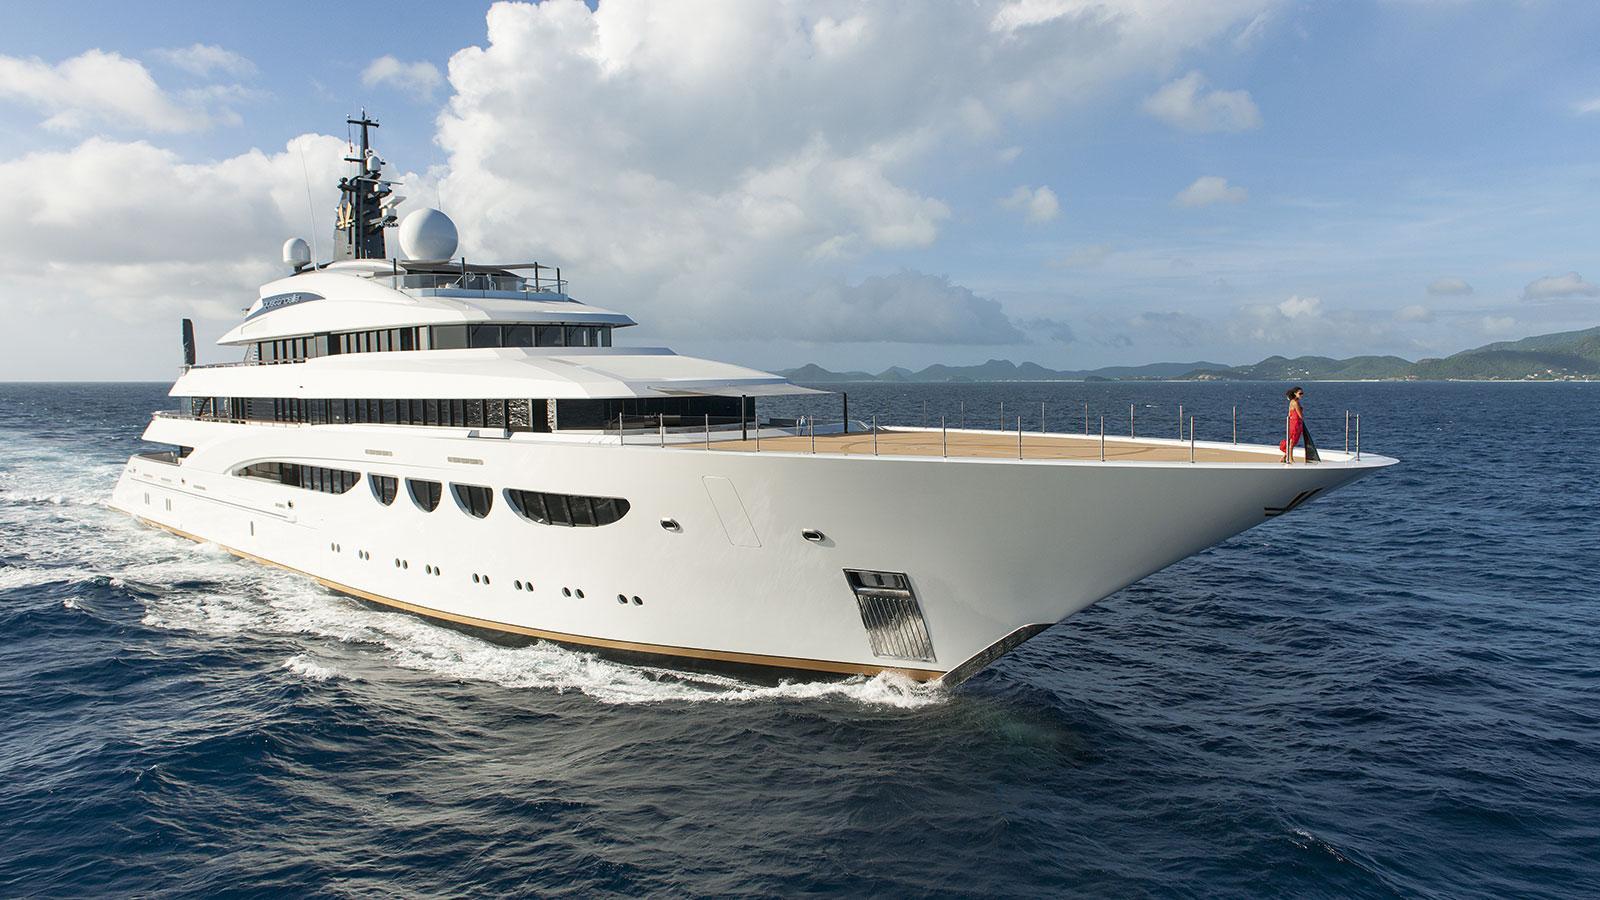 quattroelle-motor-yacht-lurssen-2013-86m-profile-bow